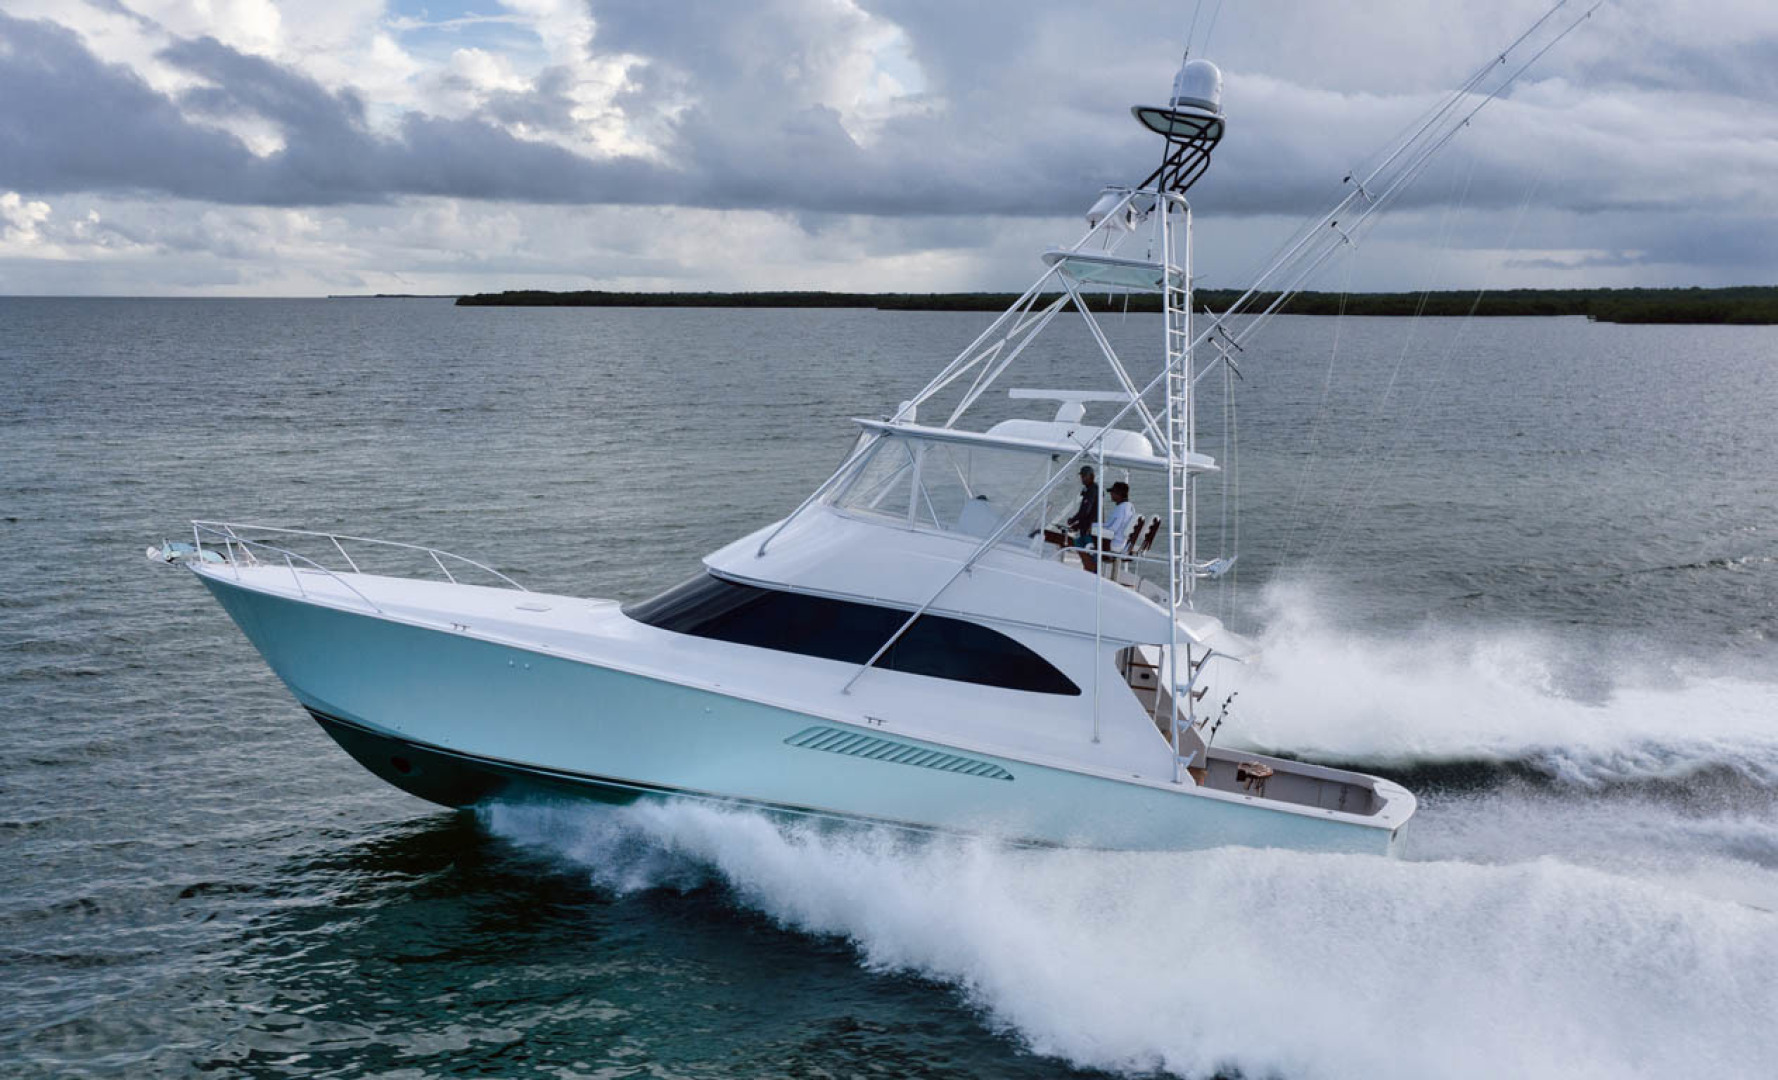 Viking-Convertible 2009-MOLLIE K Key Largo-Florida-United States-Port View-1487439 | Thumbnail